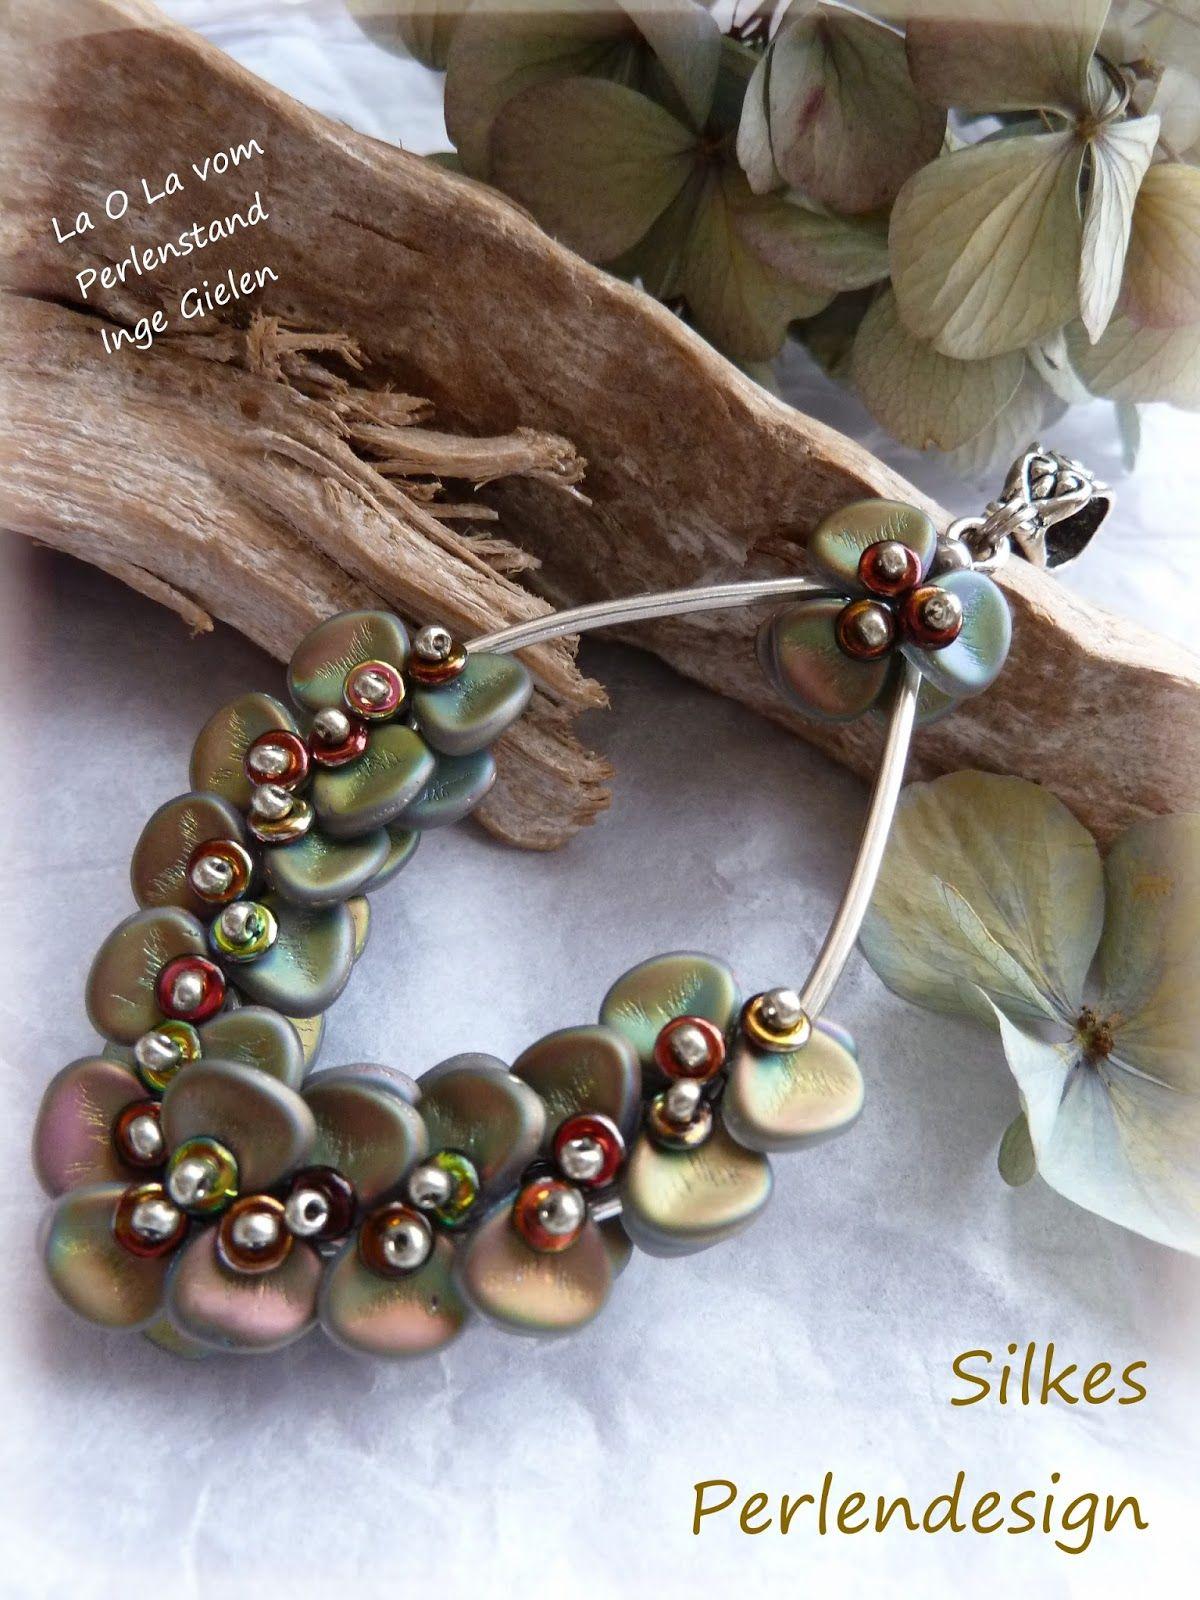 Silkes Perlendesign: La O La